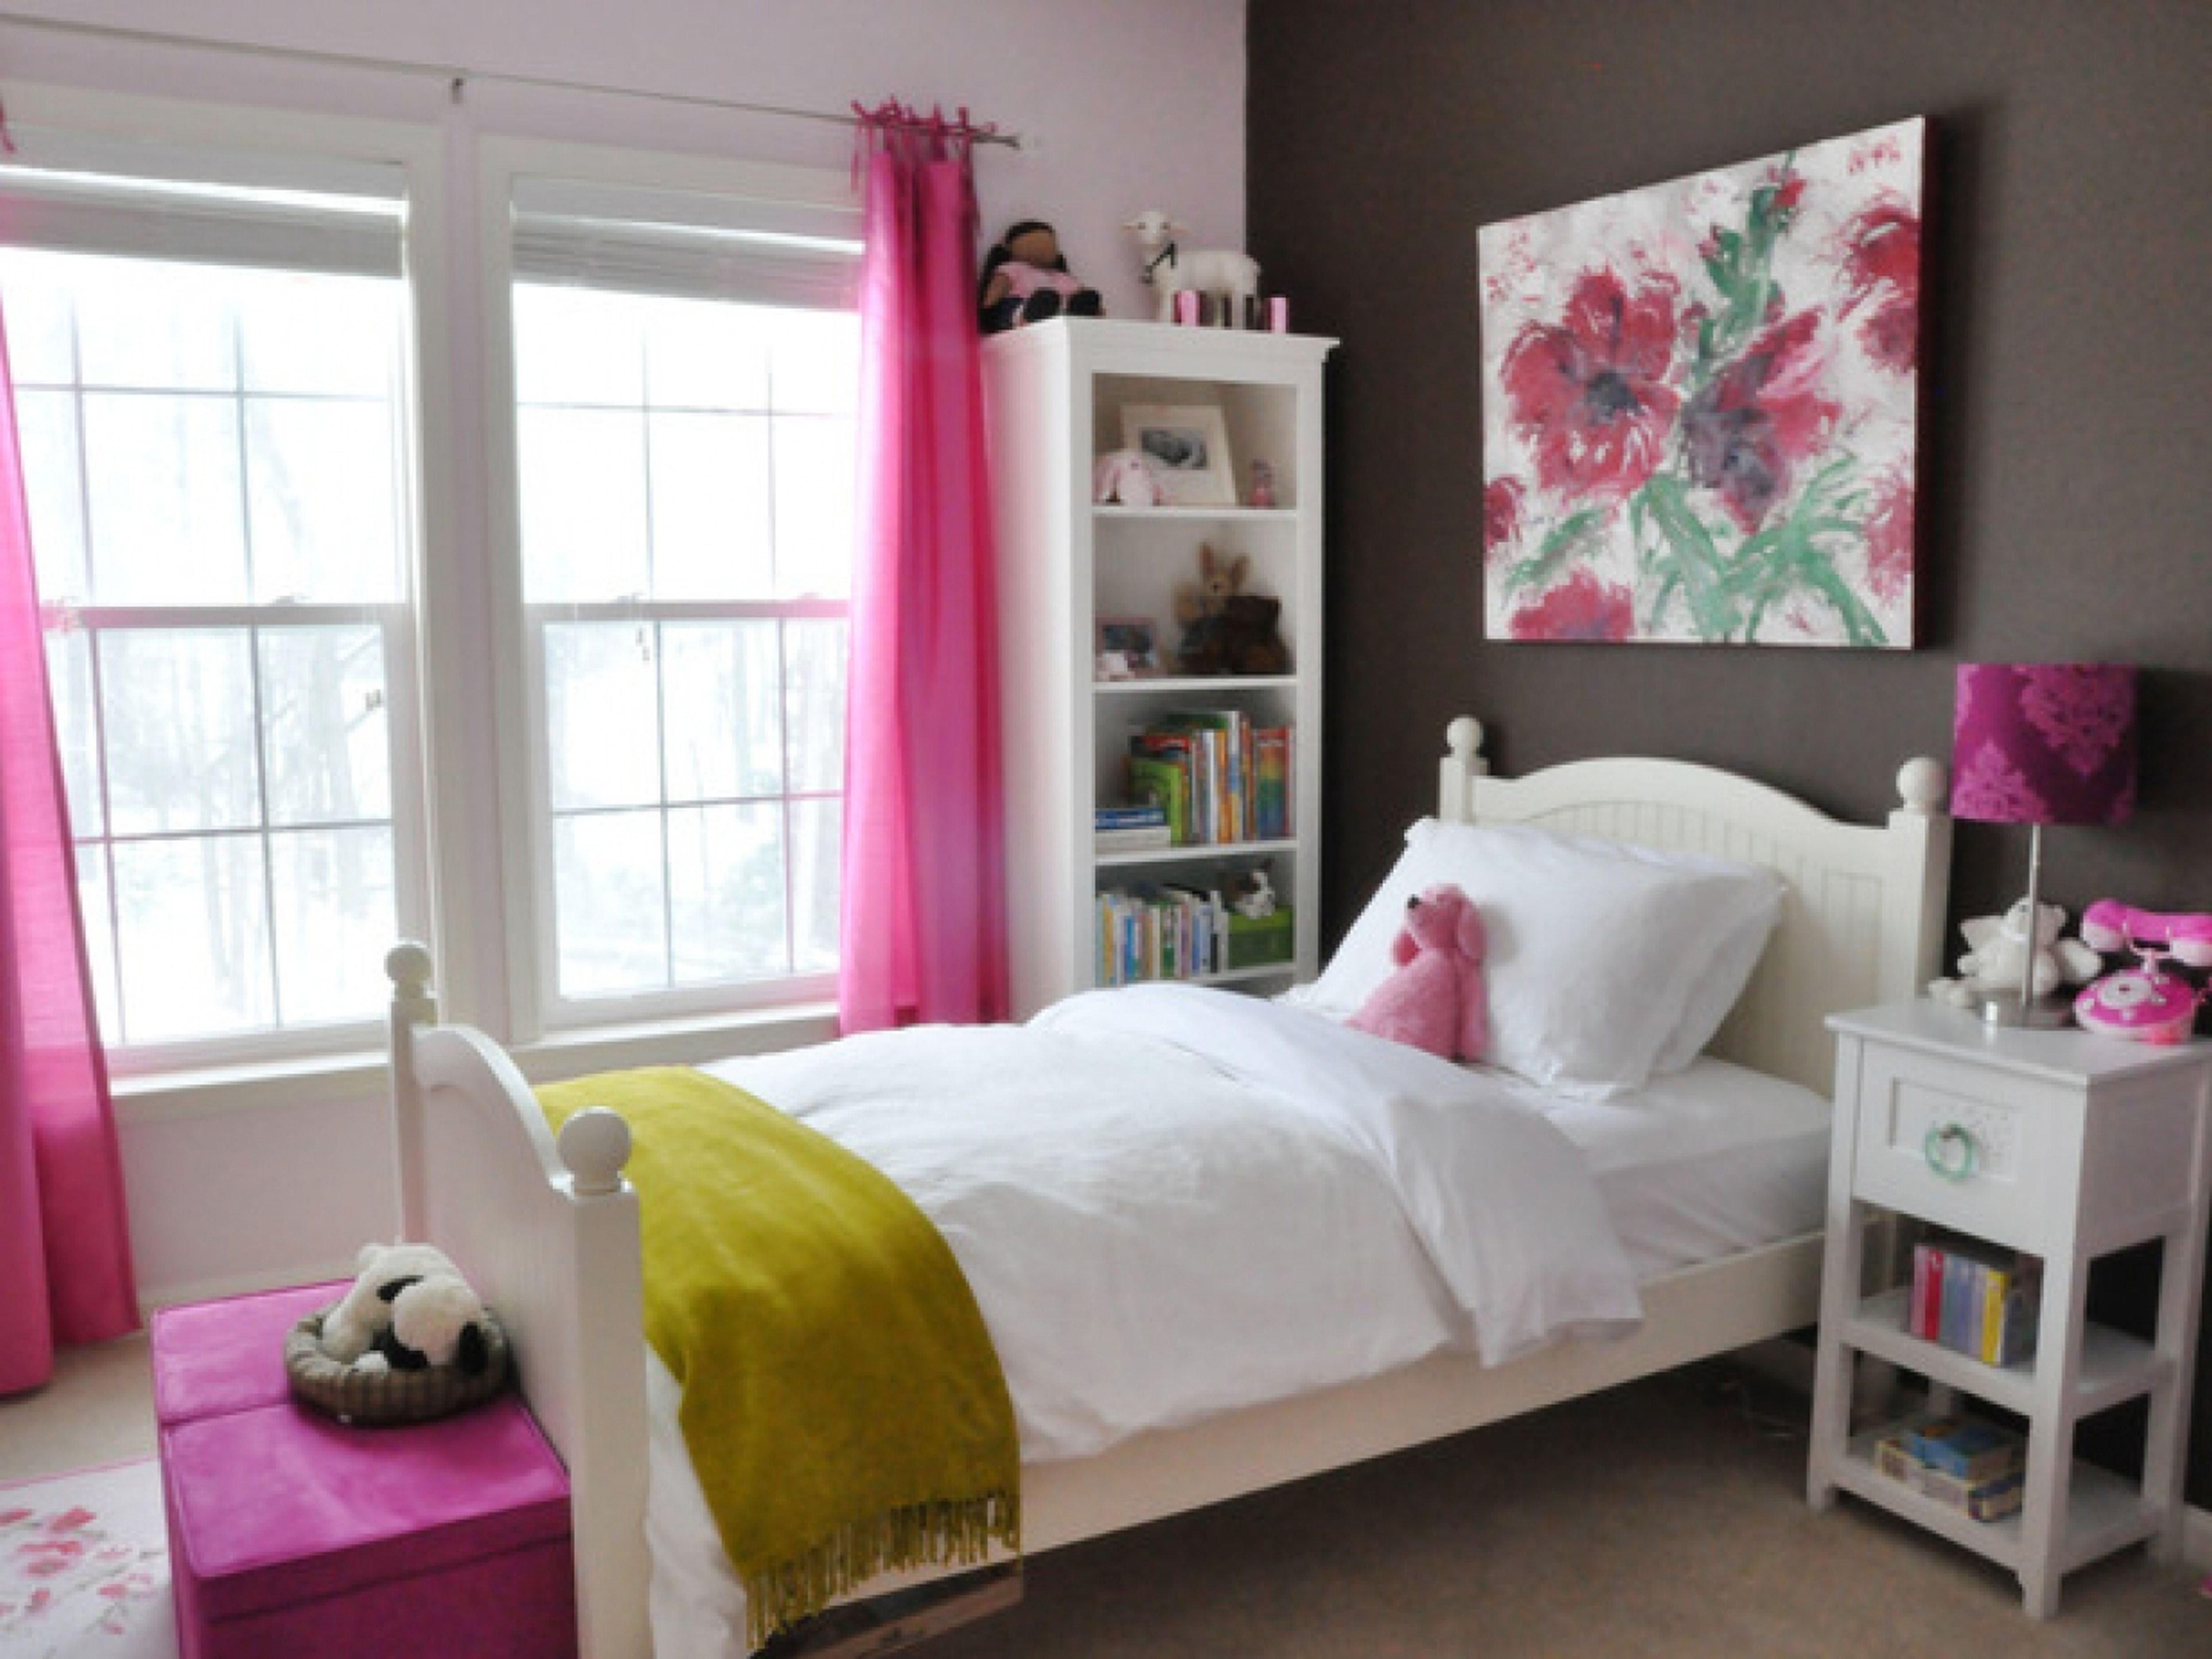 Teenage Girl Room Decor Ideas Fresh Cute Room Decor Ideas for Teenage Girls Traba Homes